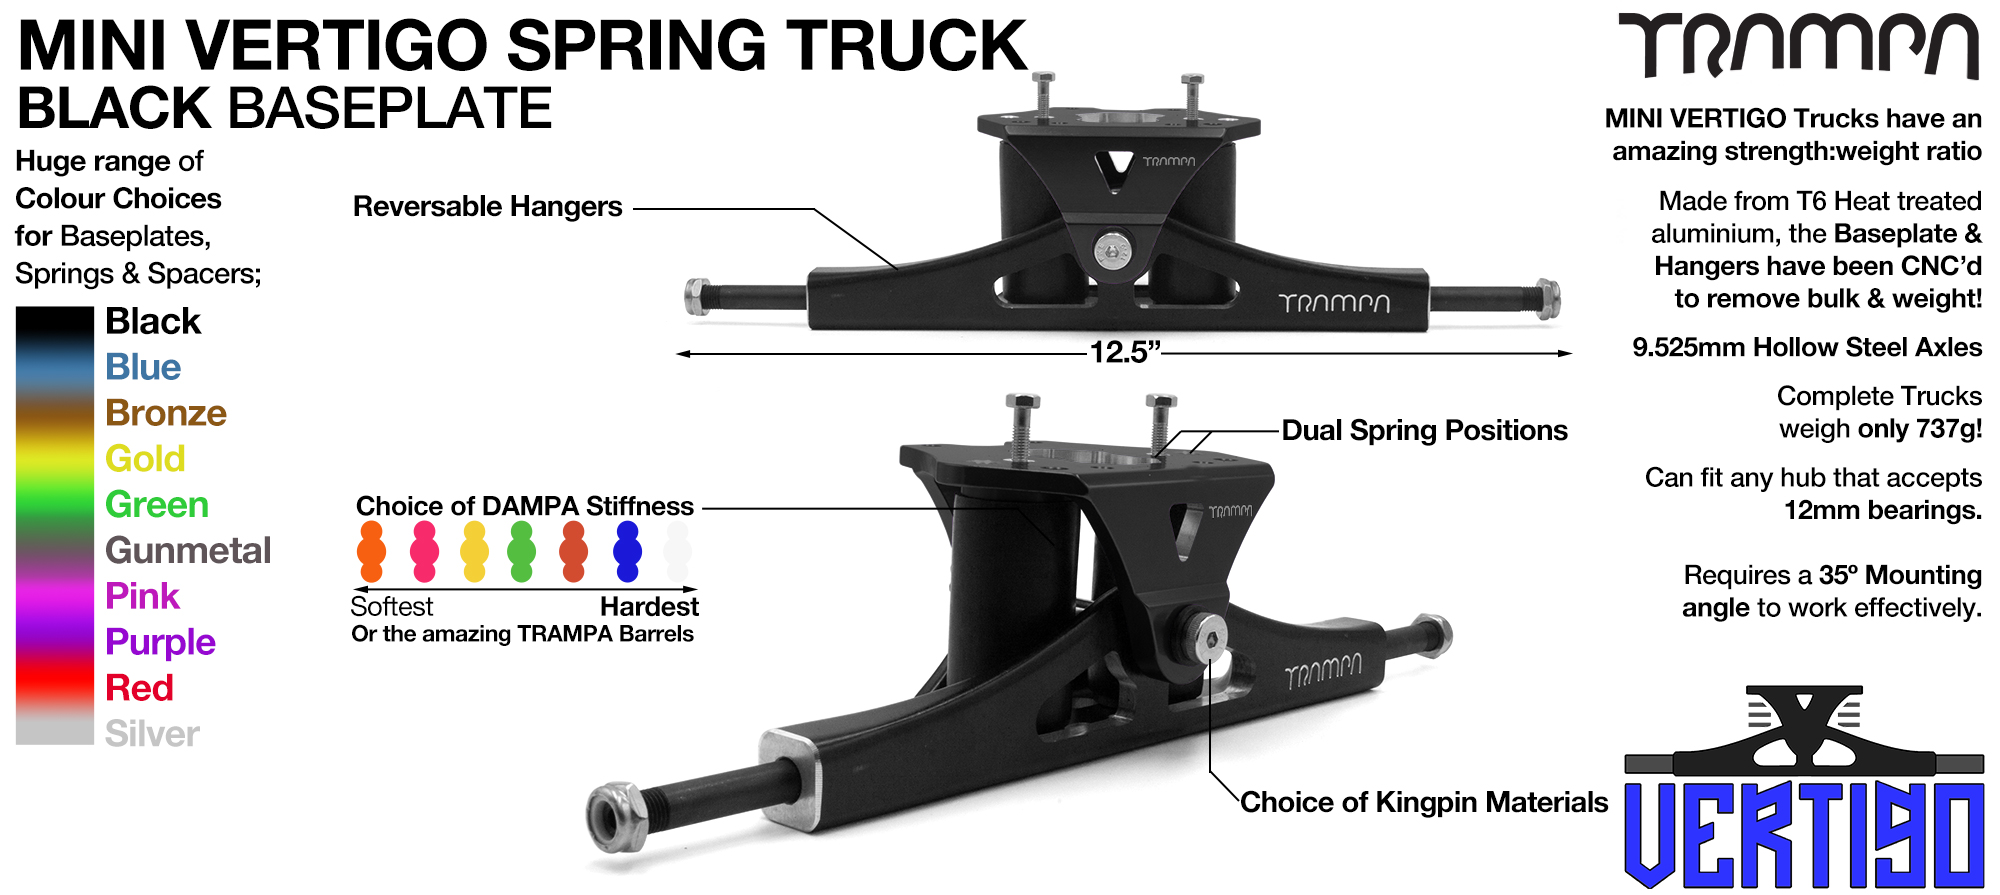 Mini VERTIGO TRAMPA TRUCKS - CNC FORGED Channel Hanger with 9.525mm HOLLOW Steel Axle CNC Baseplate Stainless Steel Kingpin - BLACK